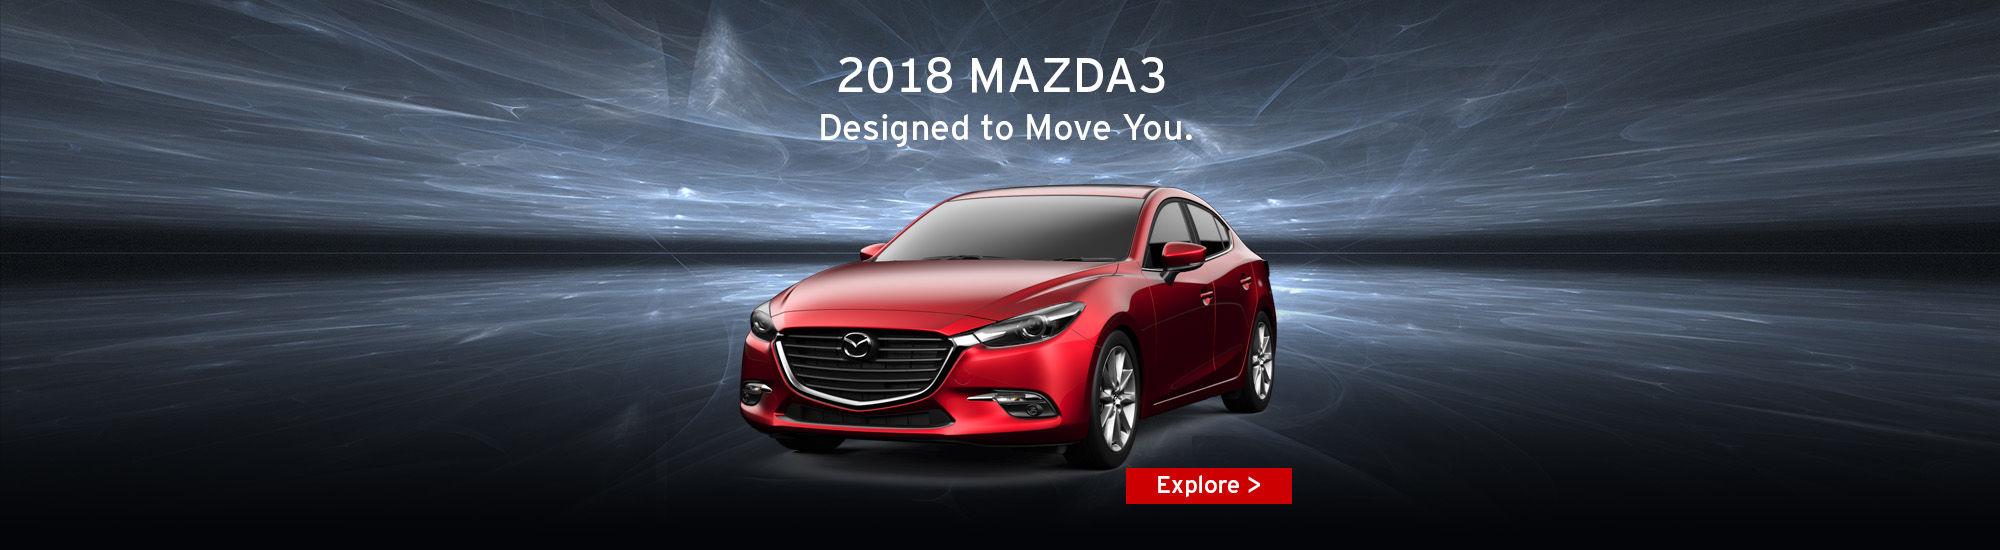 2018 Mazda3 Designed to move you